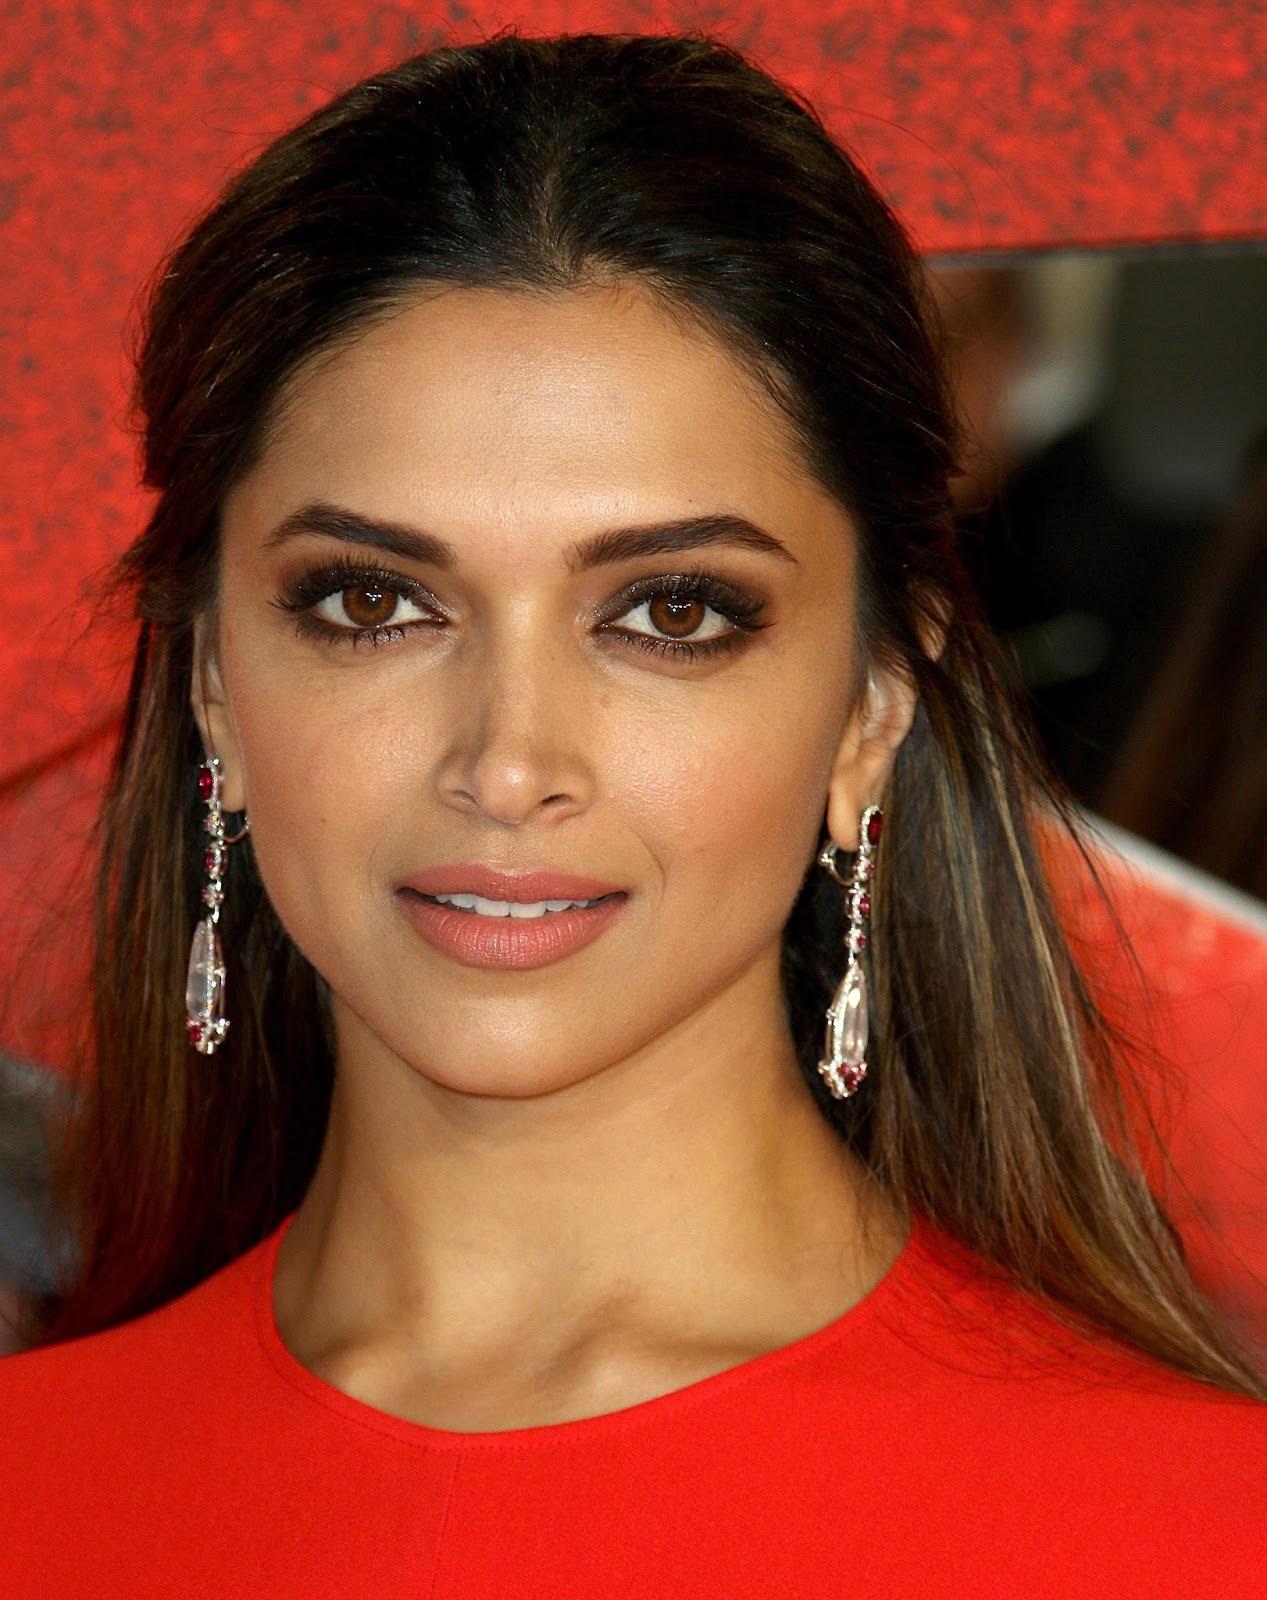 Deepika Padukone Looks Stunning In Red Dress At The -3917